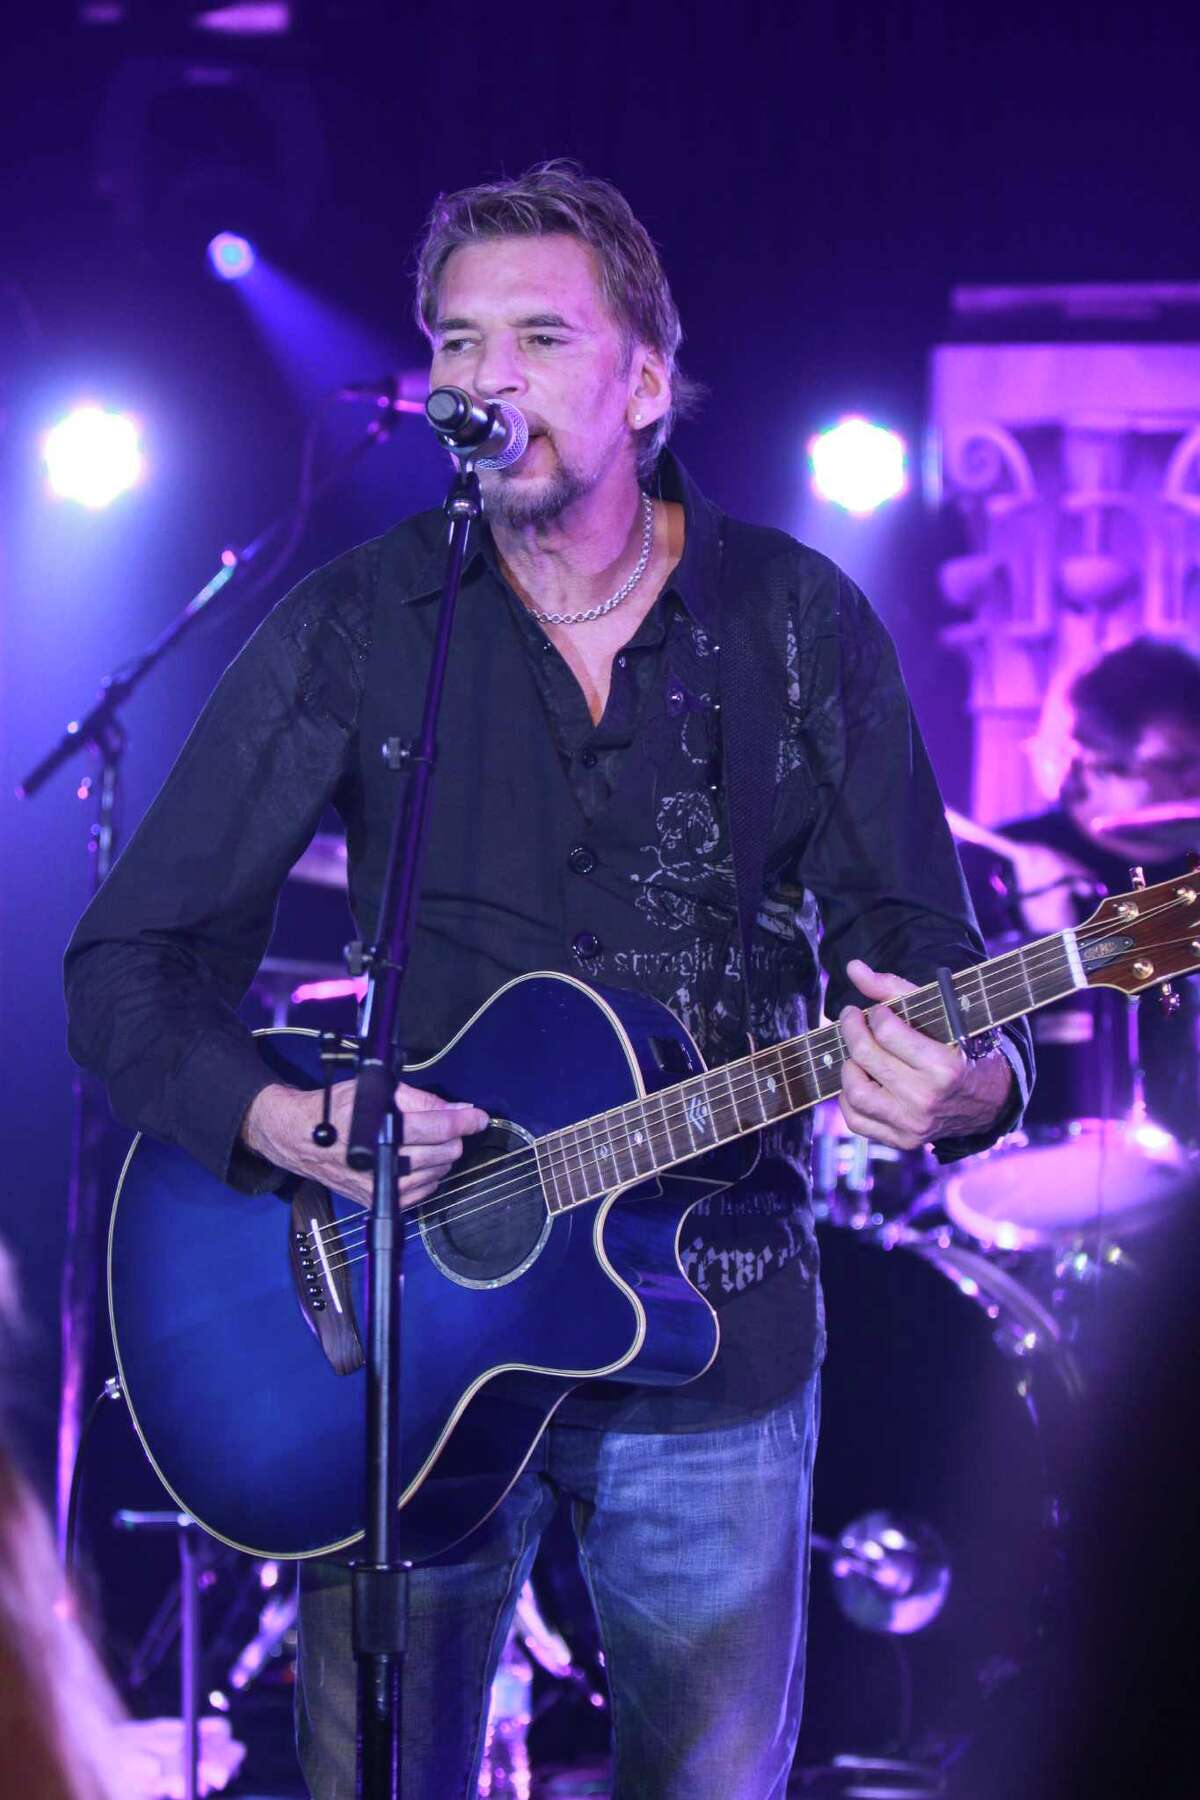 Kenny Loggins performing